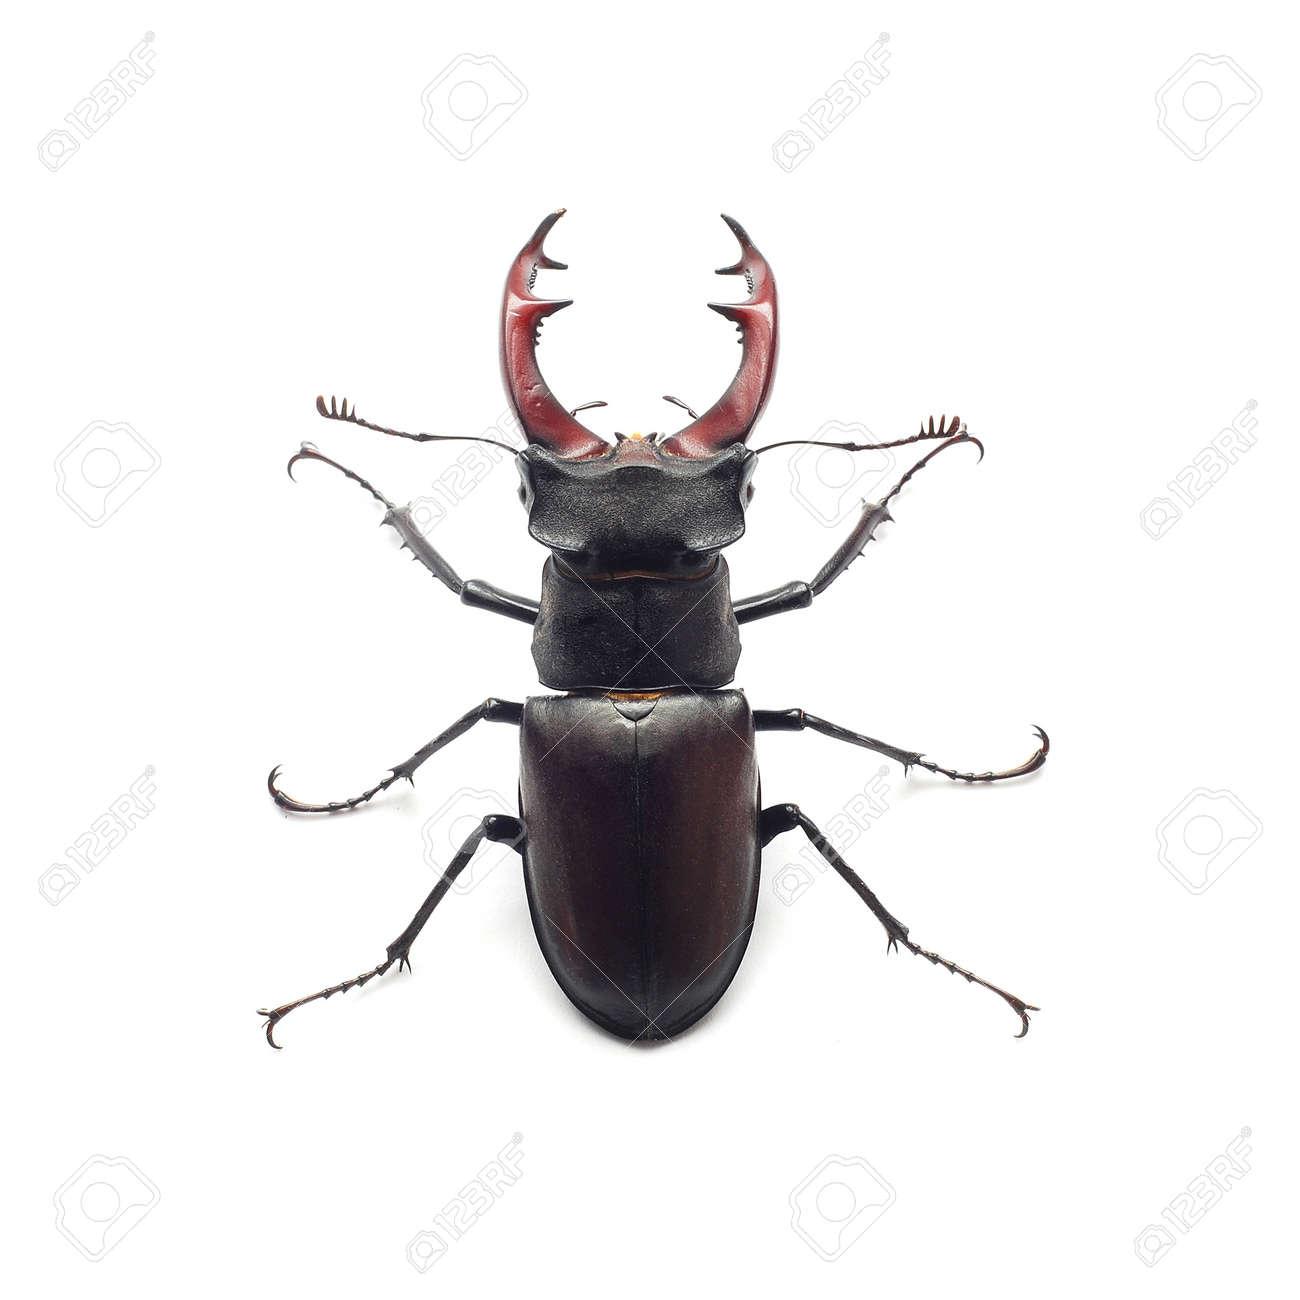 stag beetle - 9938562